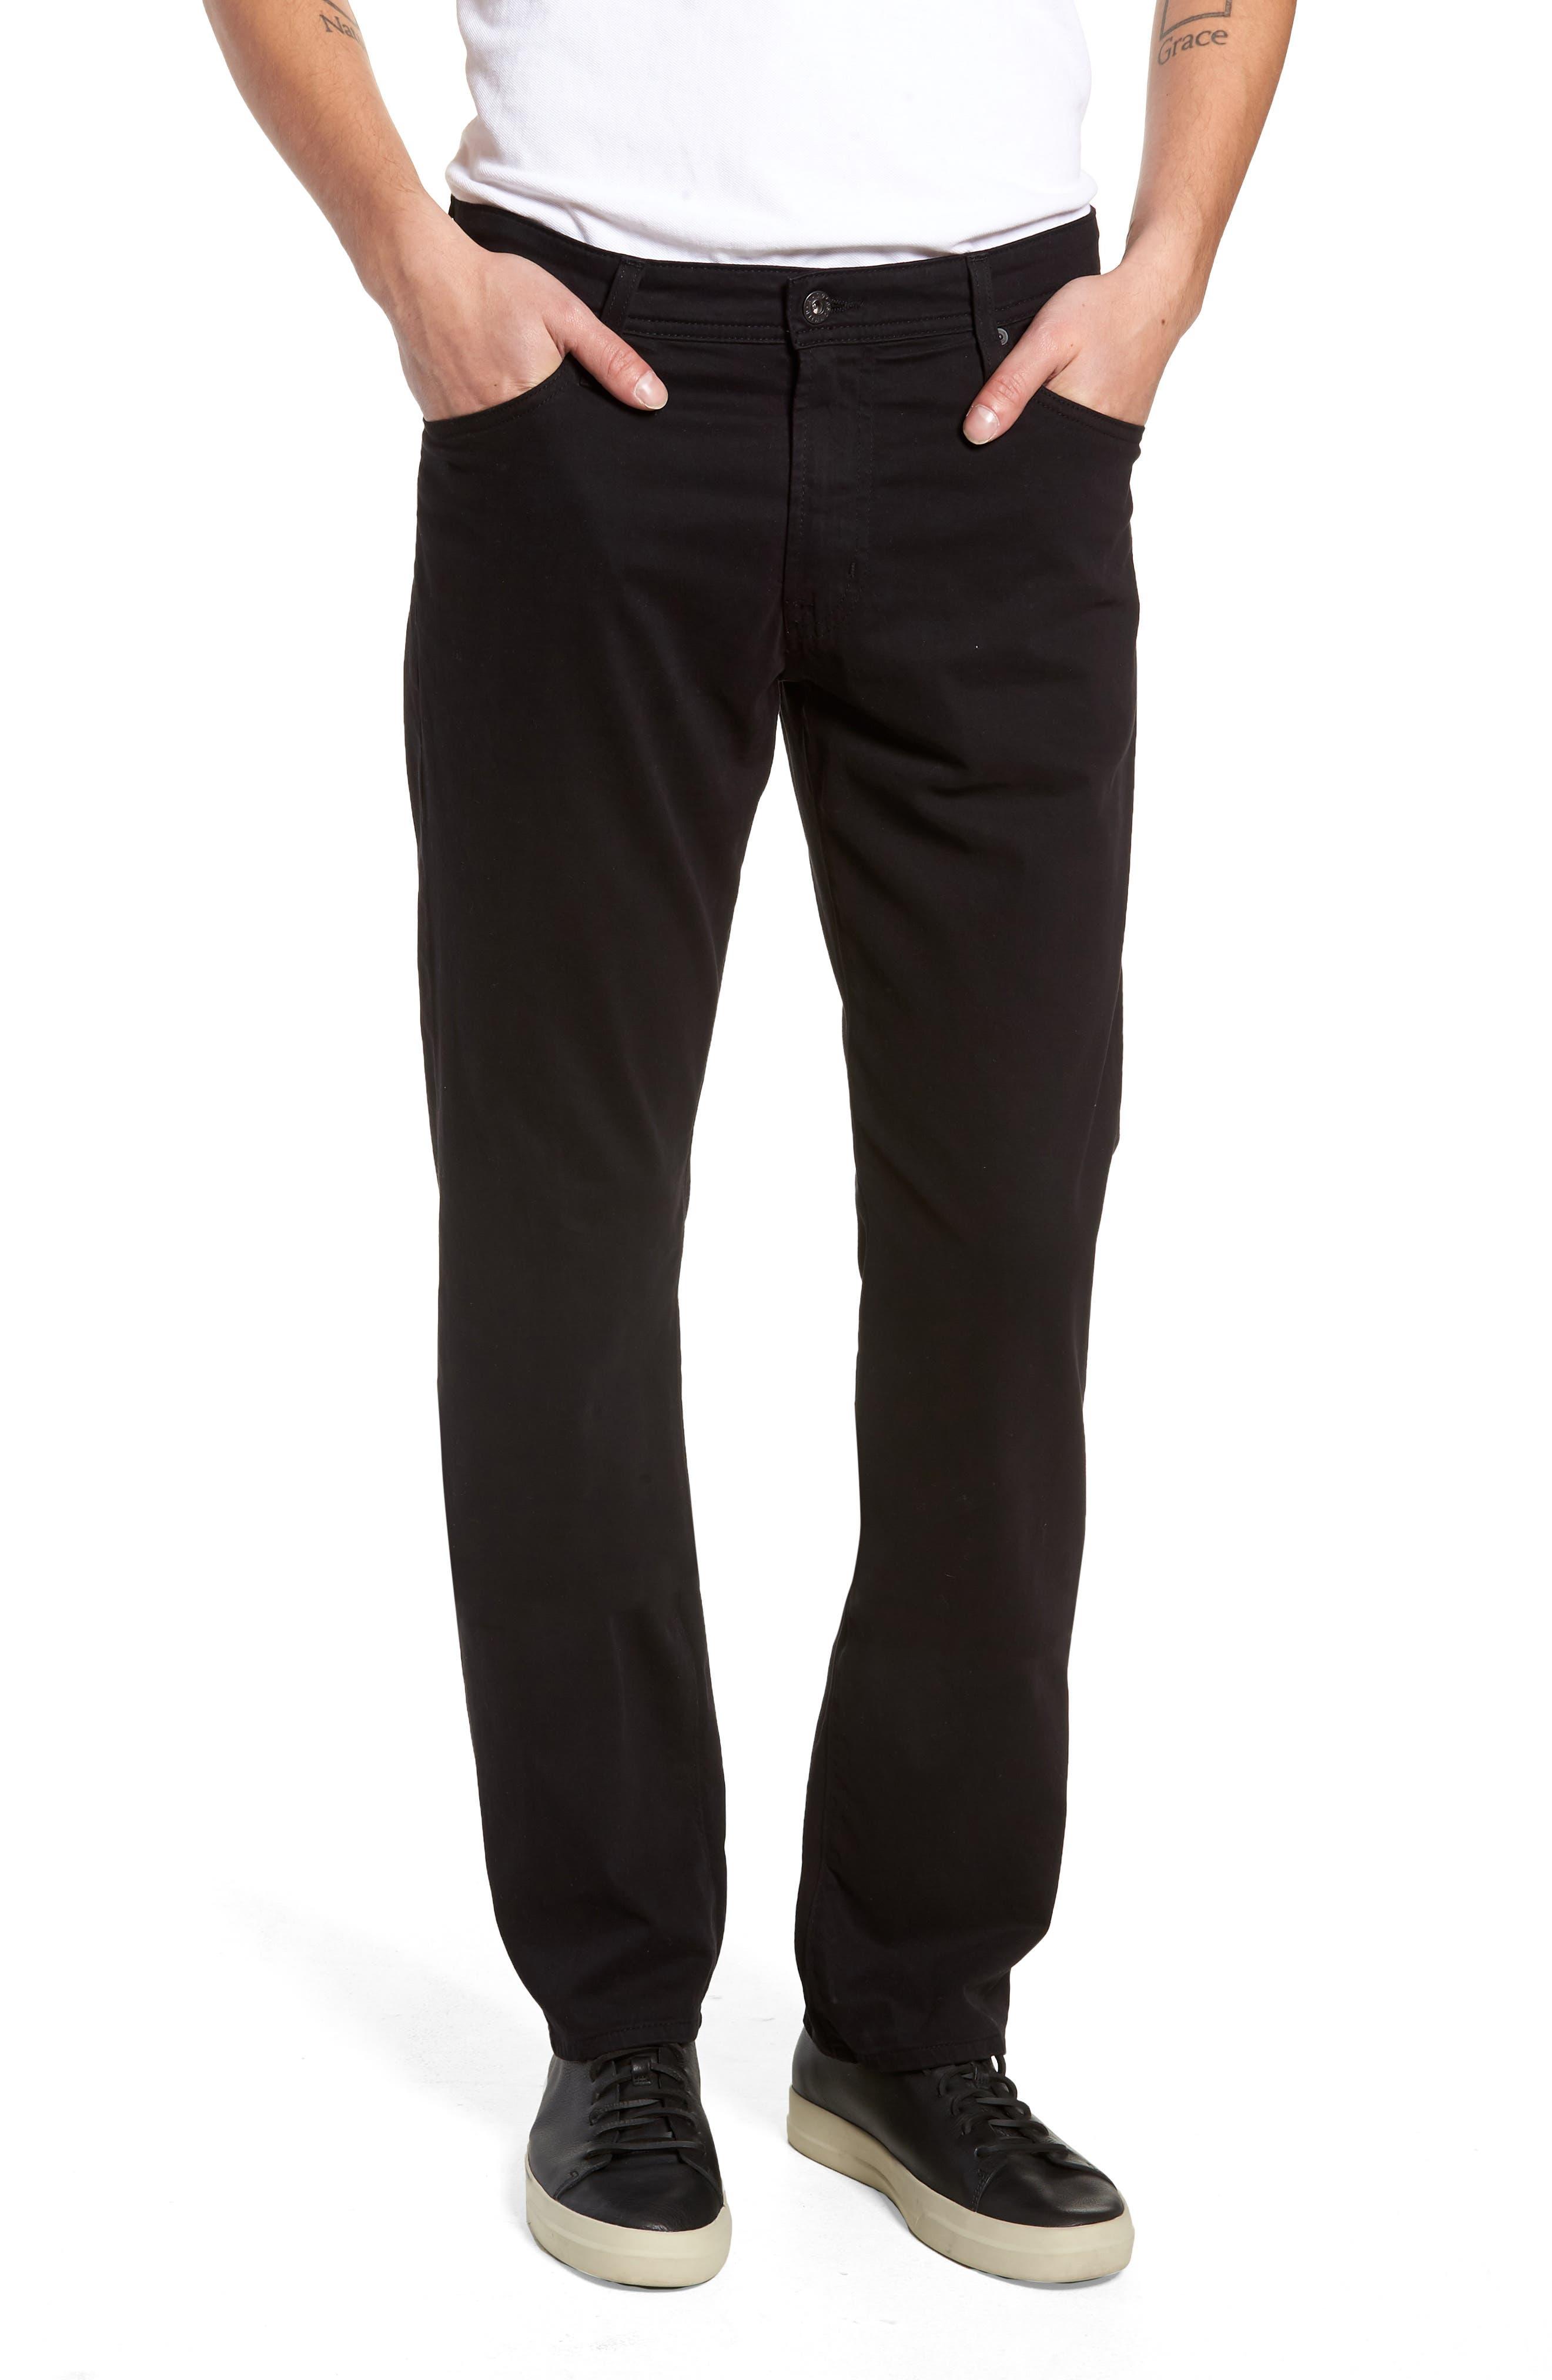 Graduate SUD Slim Straight Leg Pants,                             Alternate thumbnail 2, color,                             010